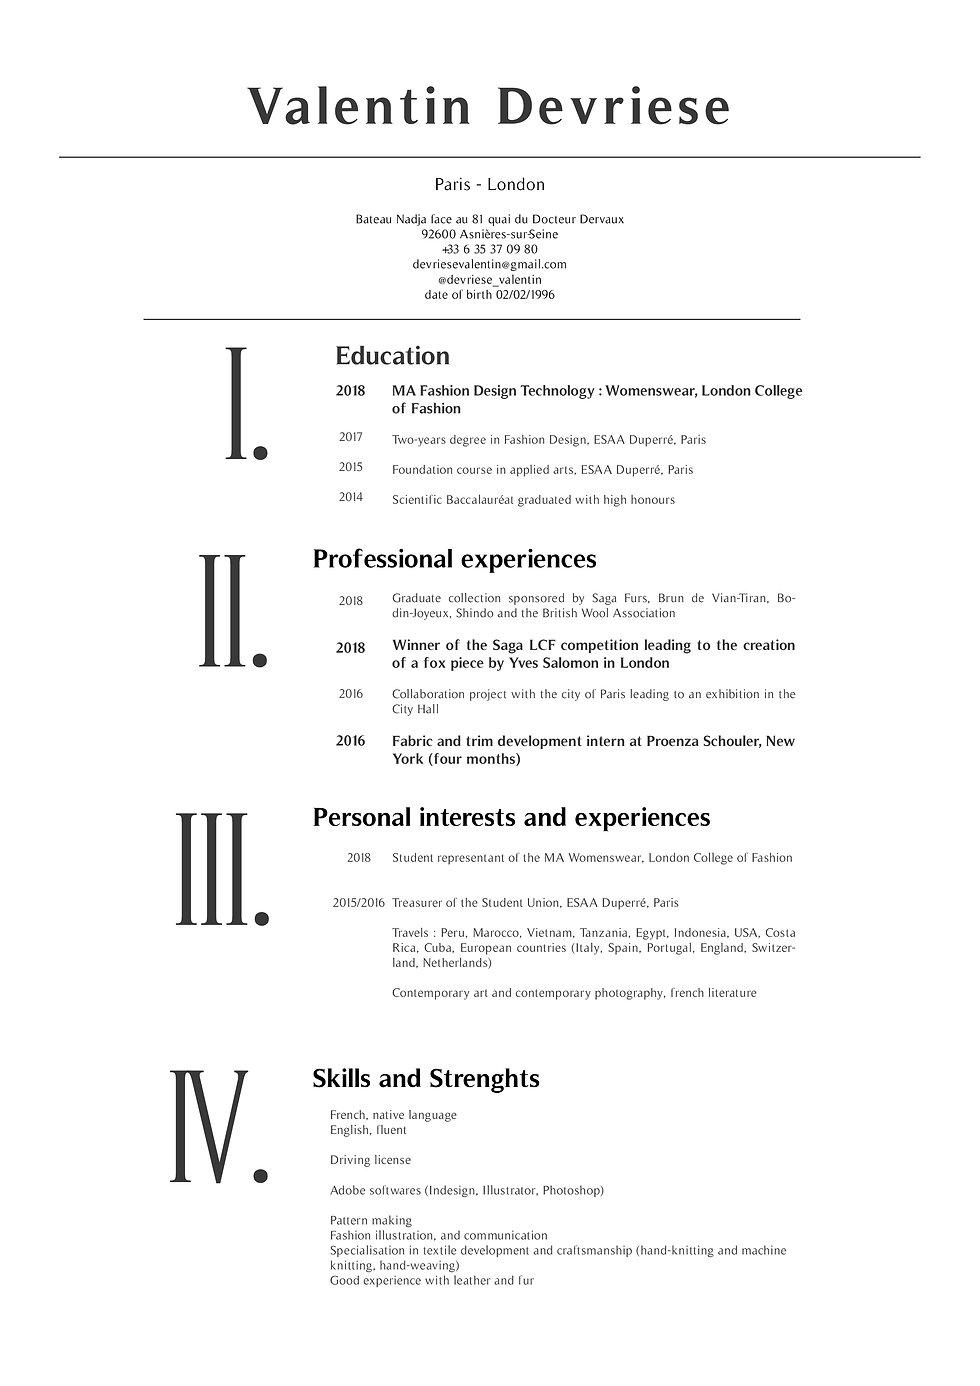 CV Valentin Devriese.jpg